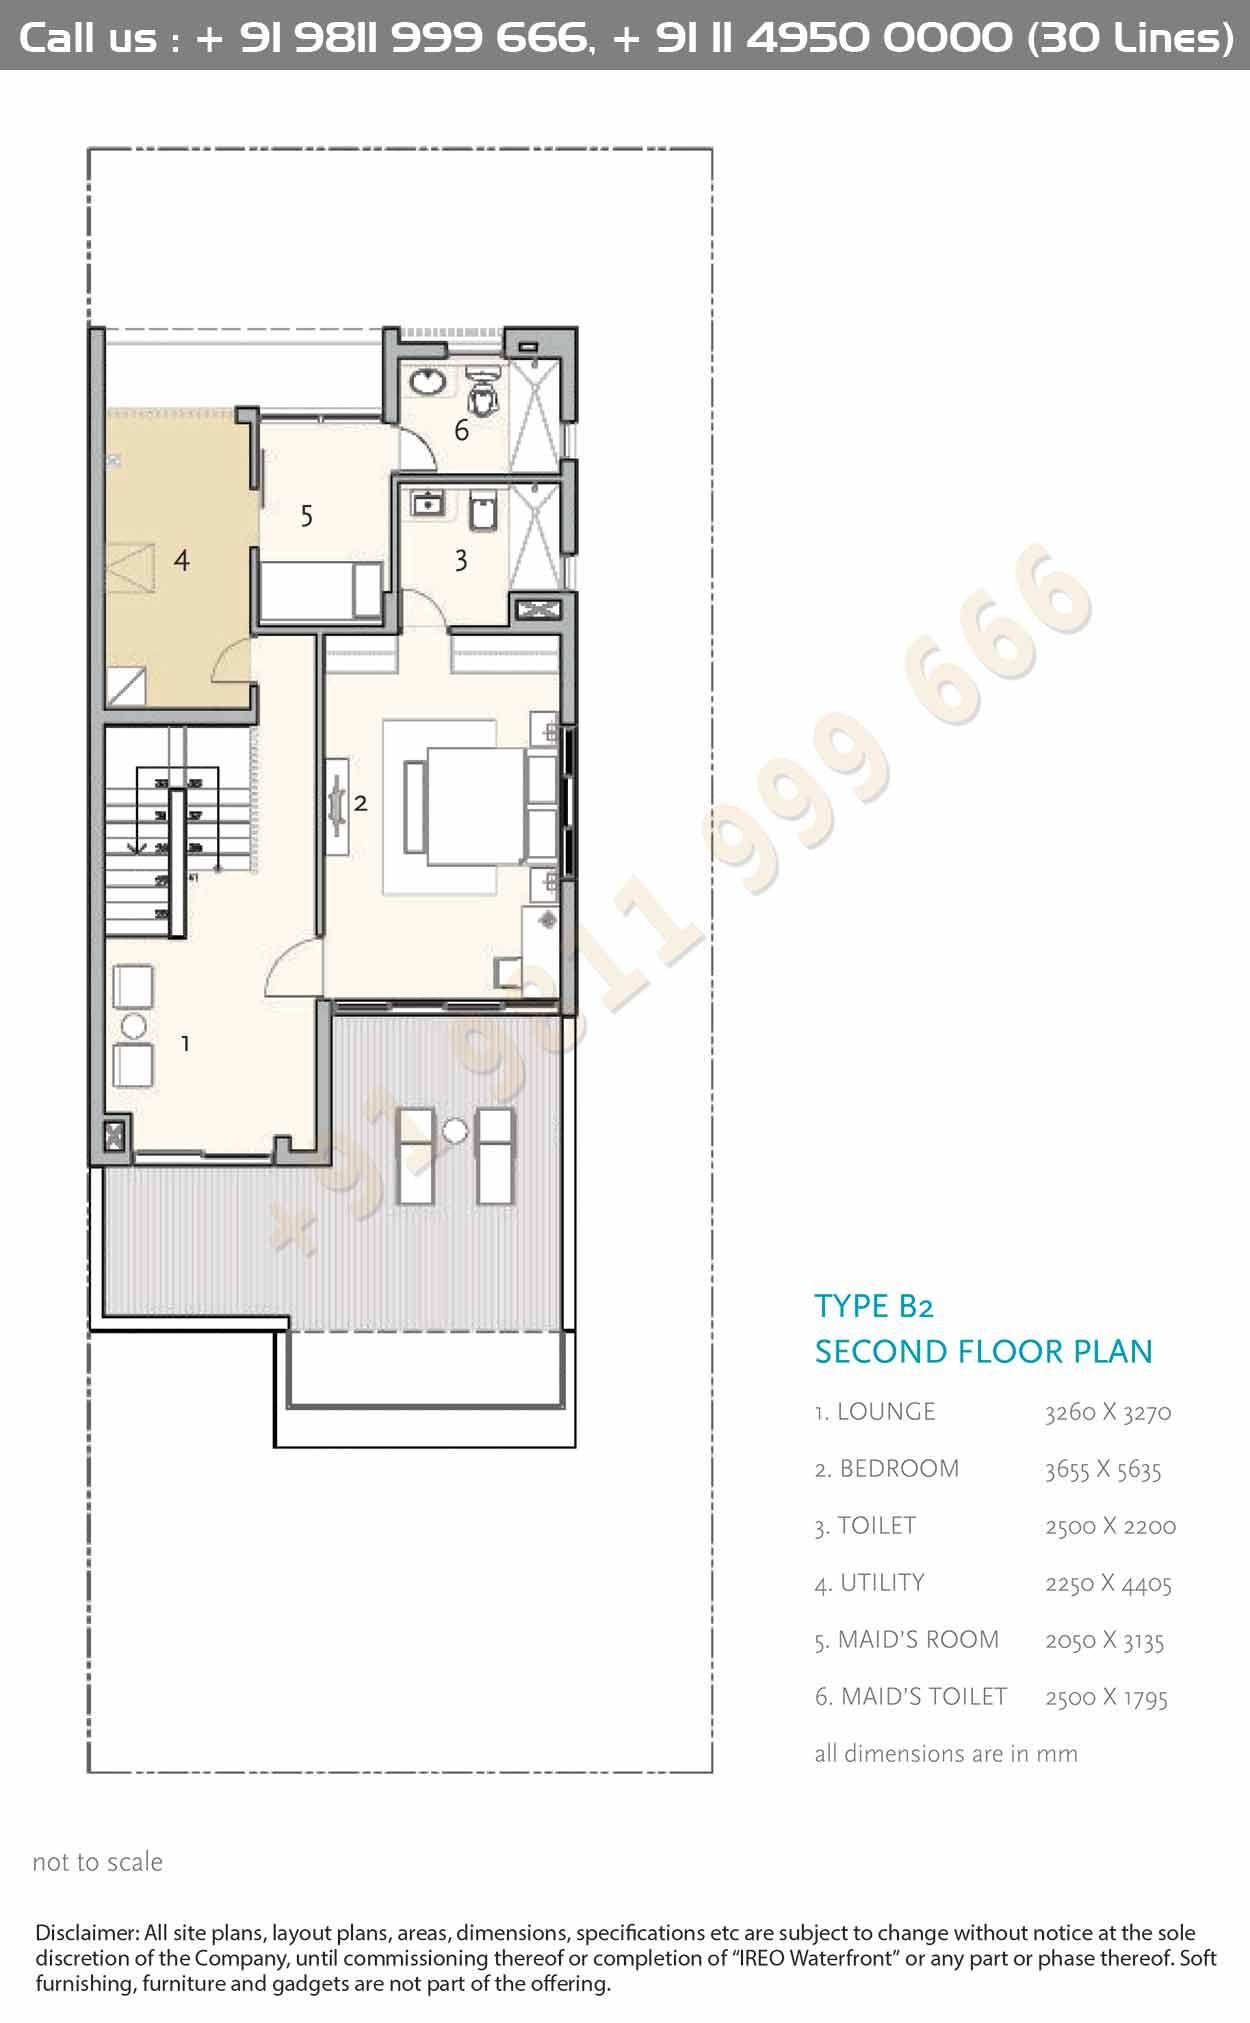 Type B2 Second Floor Plan Floor Plans Apartment Floor Plans House Construction Plan